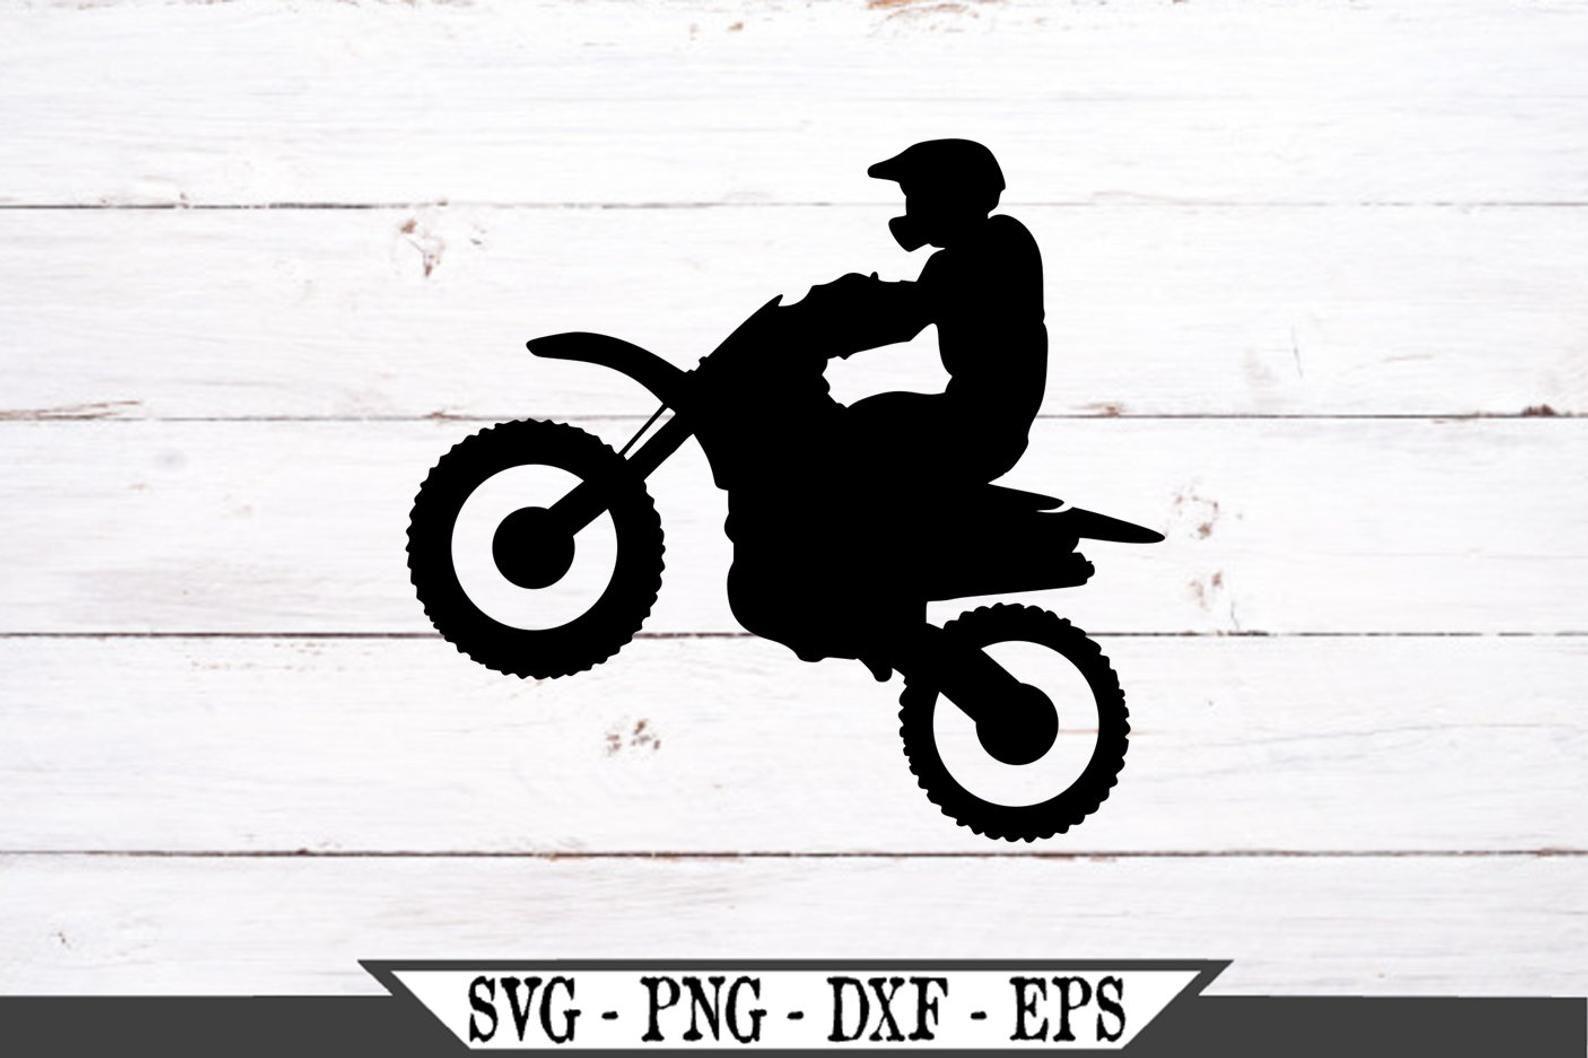 Dirt Bike SVG Racing Sports Vinyl Cutter Cut File For Cricut | Etsy